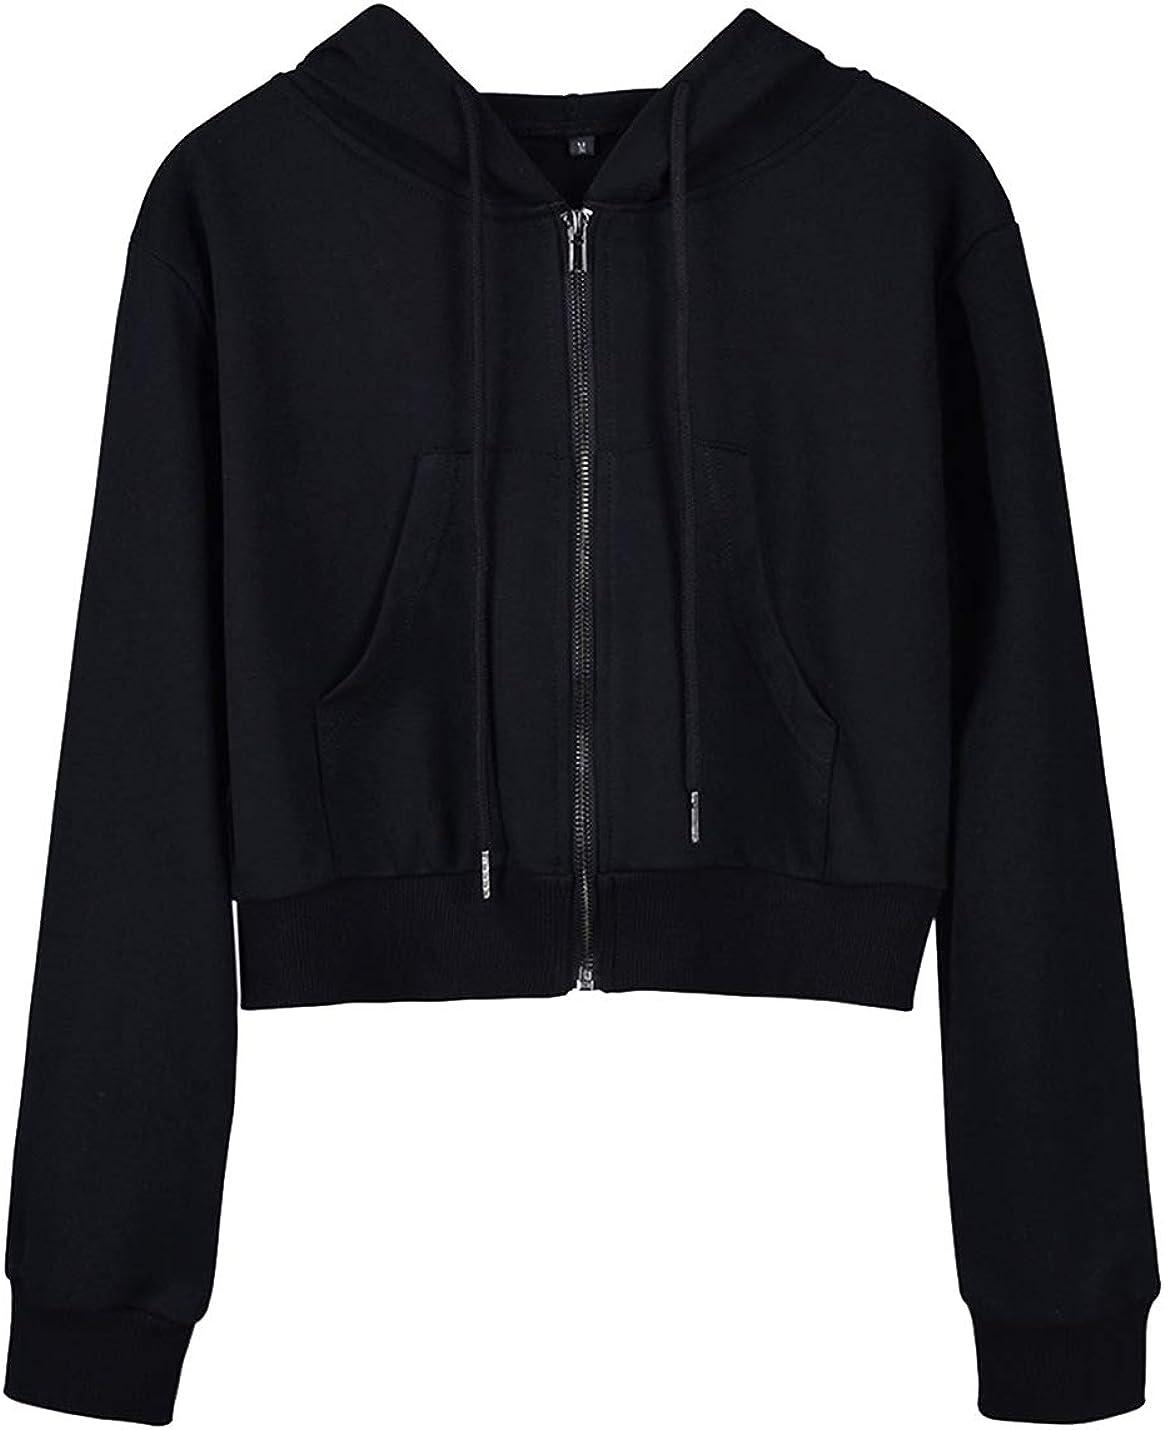 Yimoon Women's Casual Workout Long Sleeve Crop Tops Zip Up Hoodies Sweatshirts